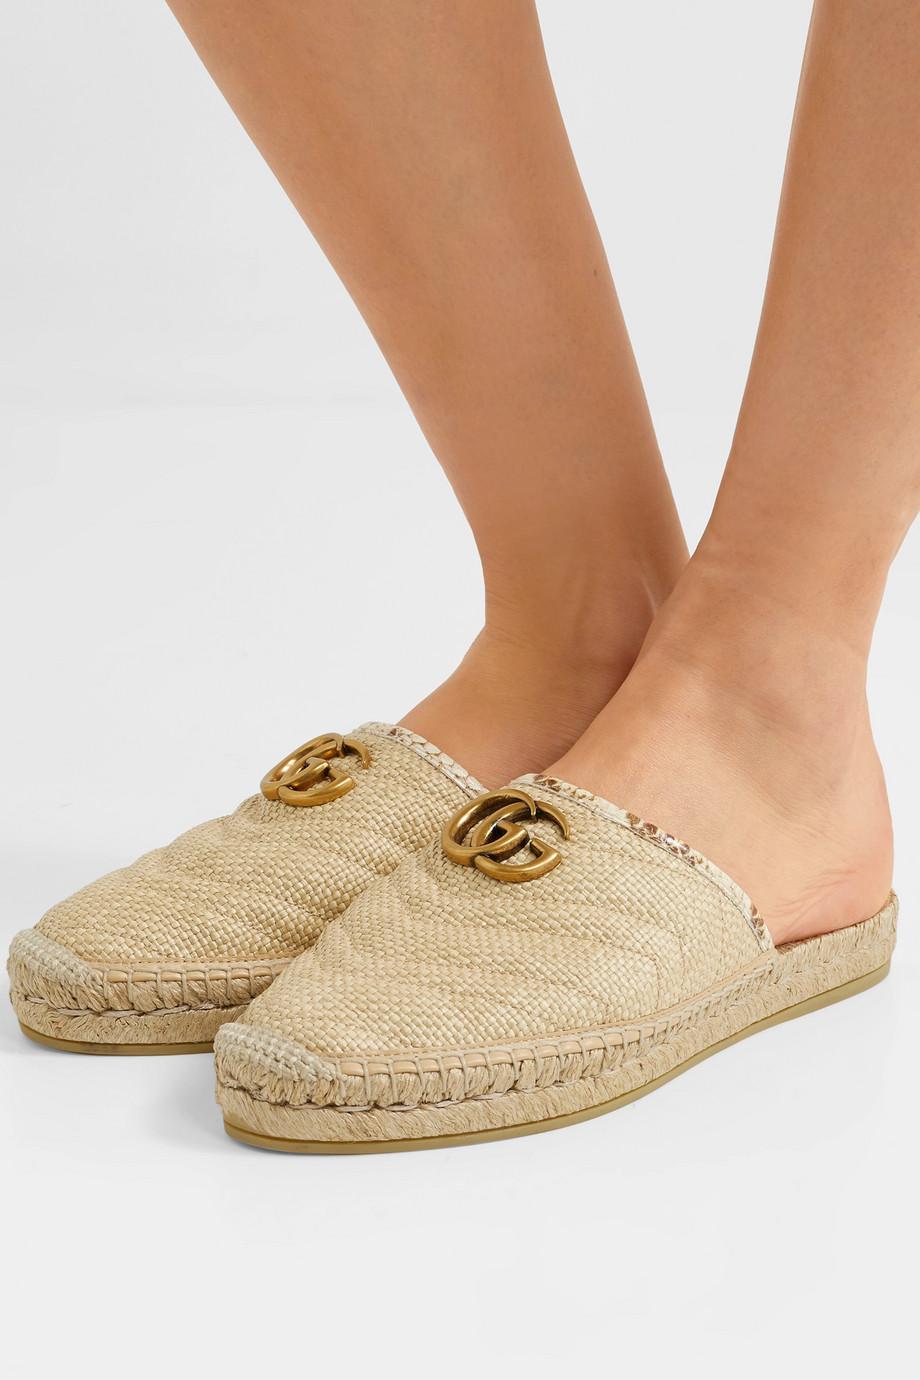 Gucci Pilar 锦蛇皮边饰拉菲草麻底拖鞋